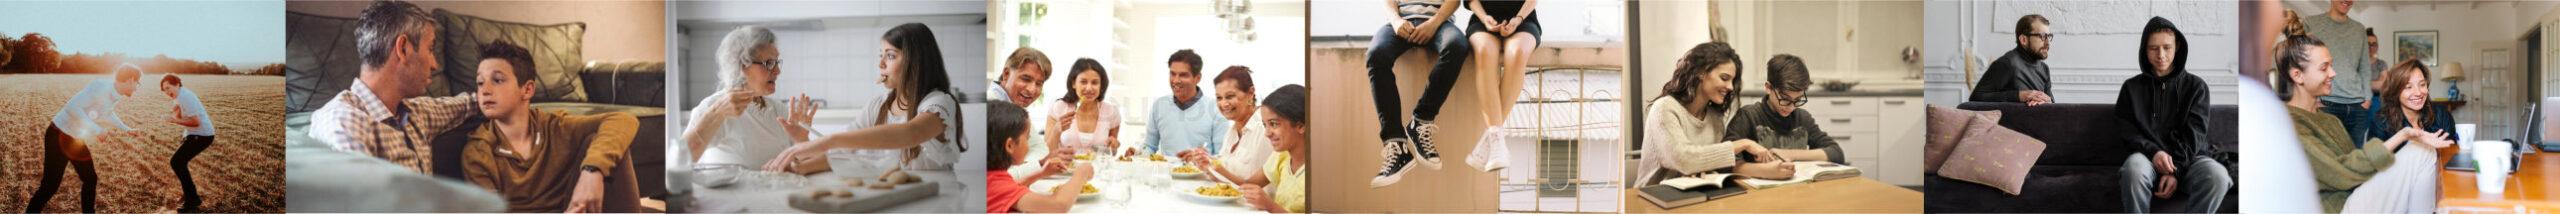 Parents & Kids Image Collage